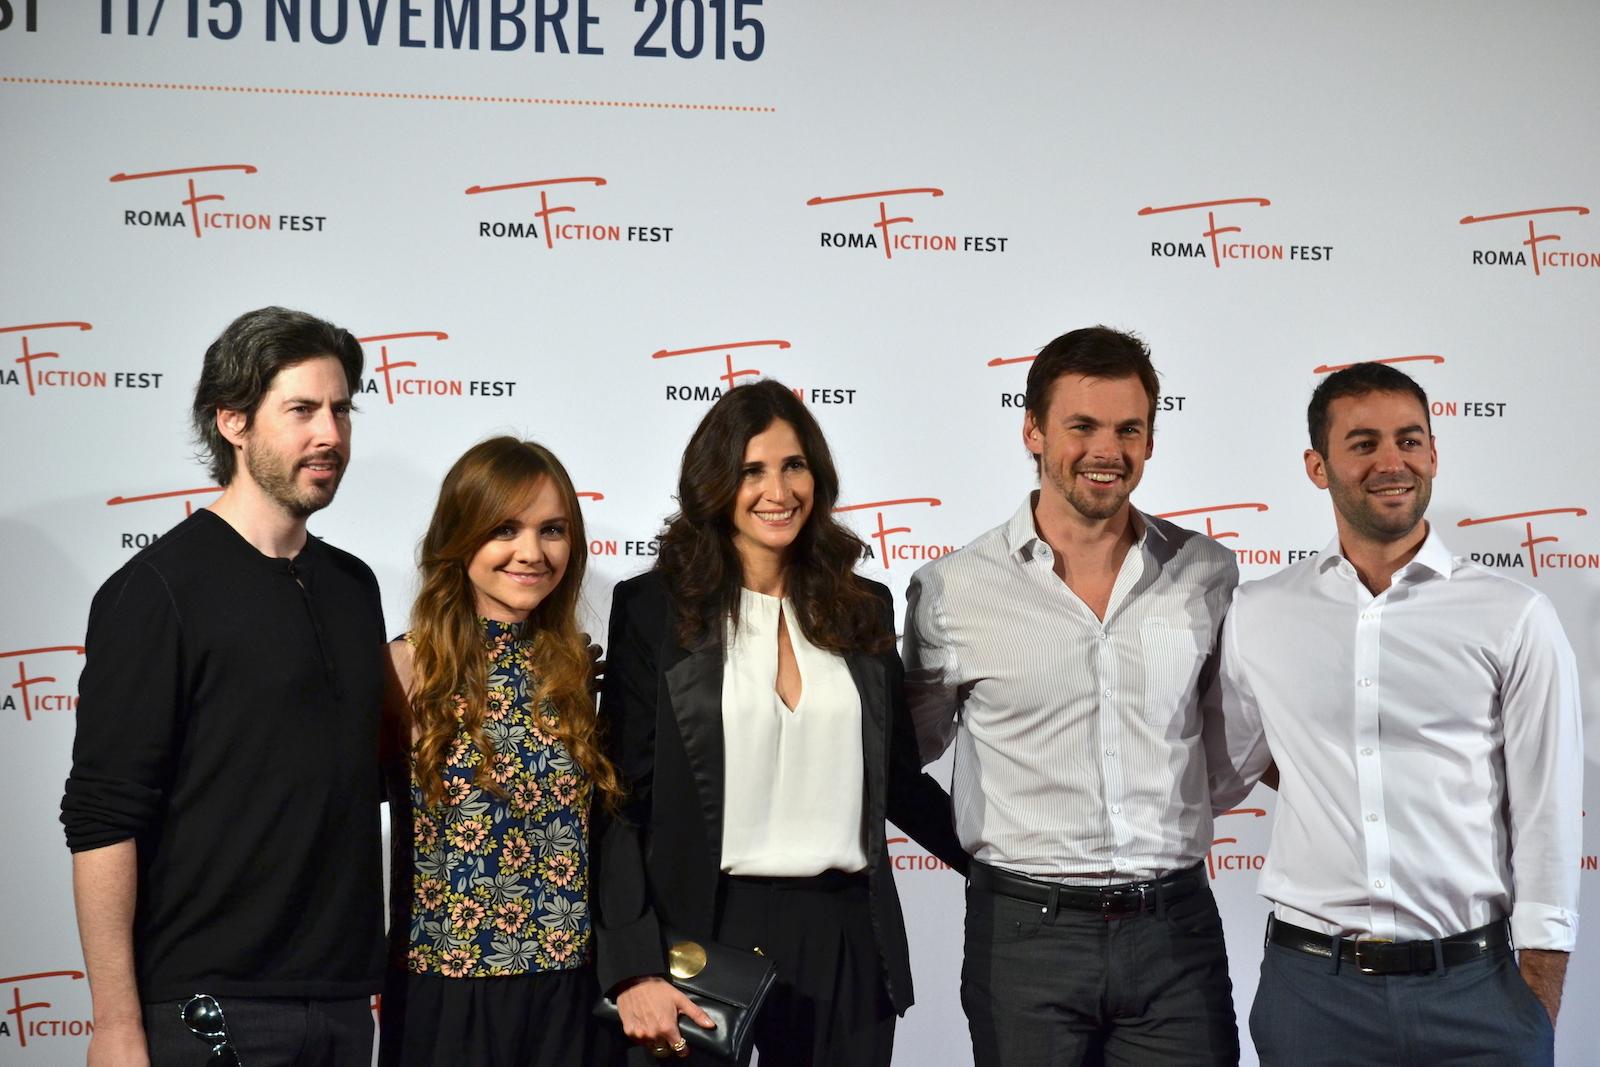 Roma Fiction Fest 2015: Zander Lehman, Jason Reitman, Michaela Watkins, Tommy Dewey e Tara Lynne Barr posano al photocall di Casual